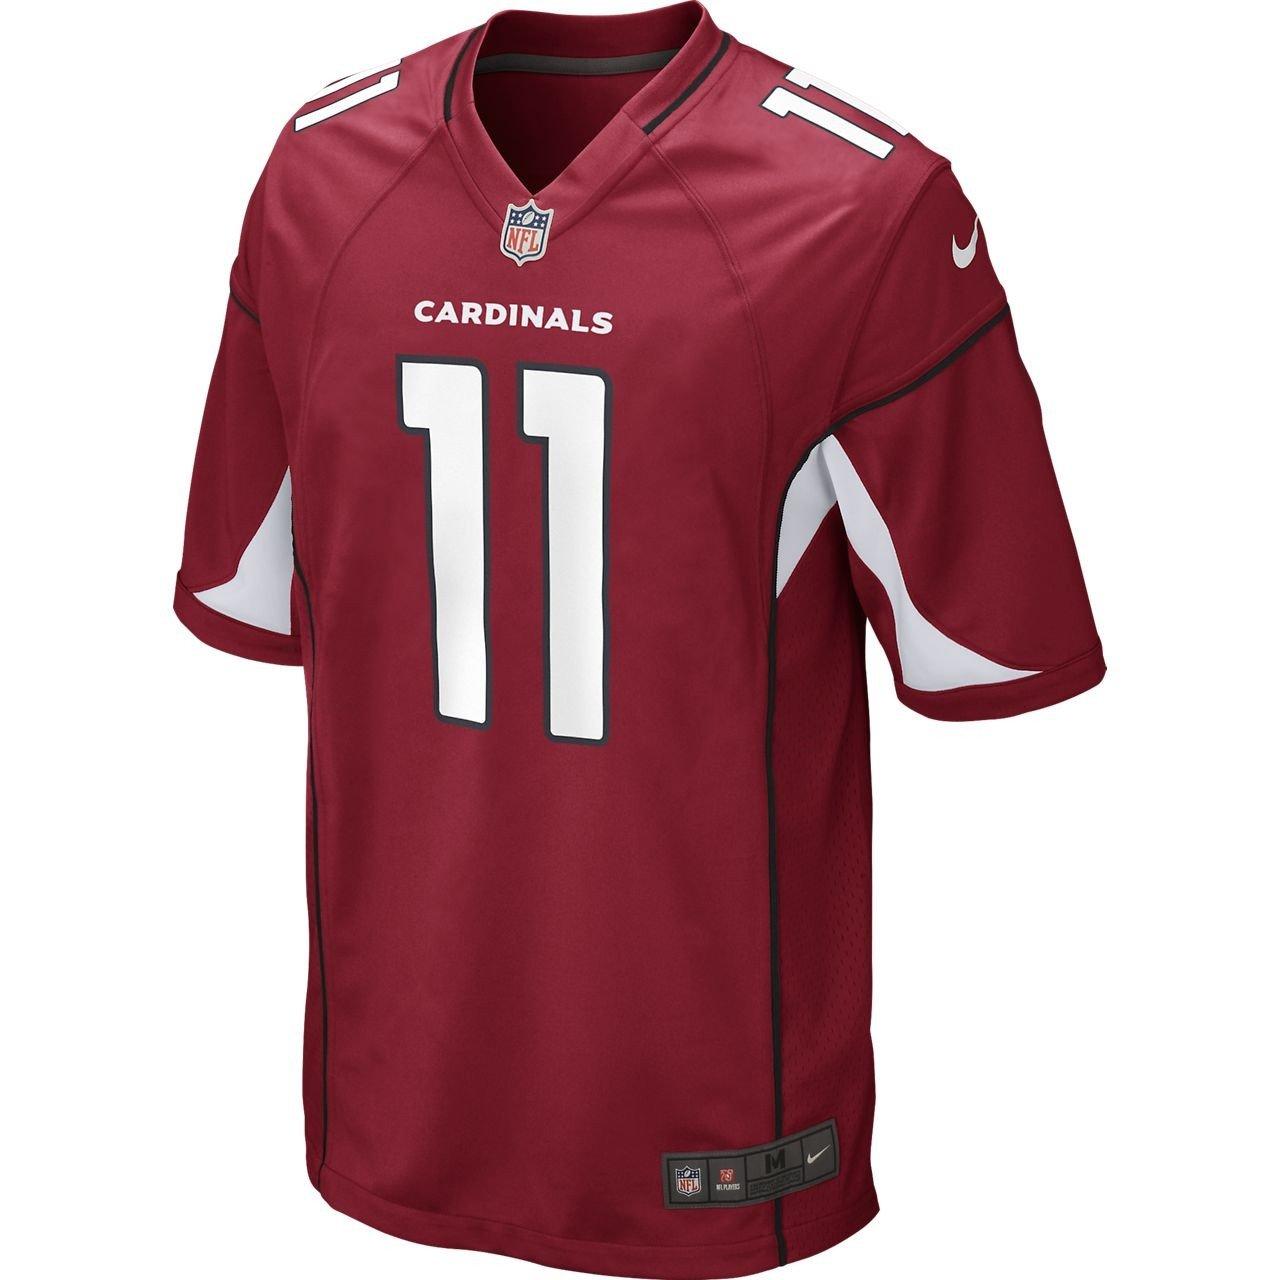 73a2d284f Amazon.com | Nike Men's Larry Fitzgerald Arizona Cardinals Game Jersey |  Shoes